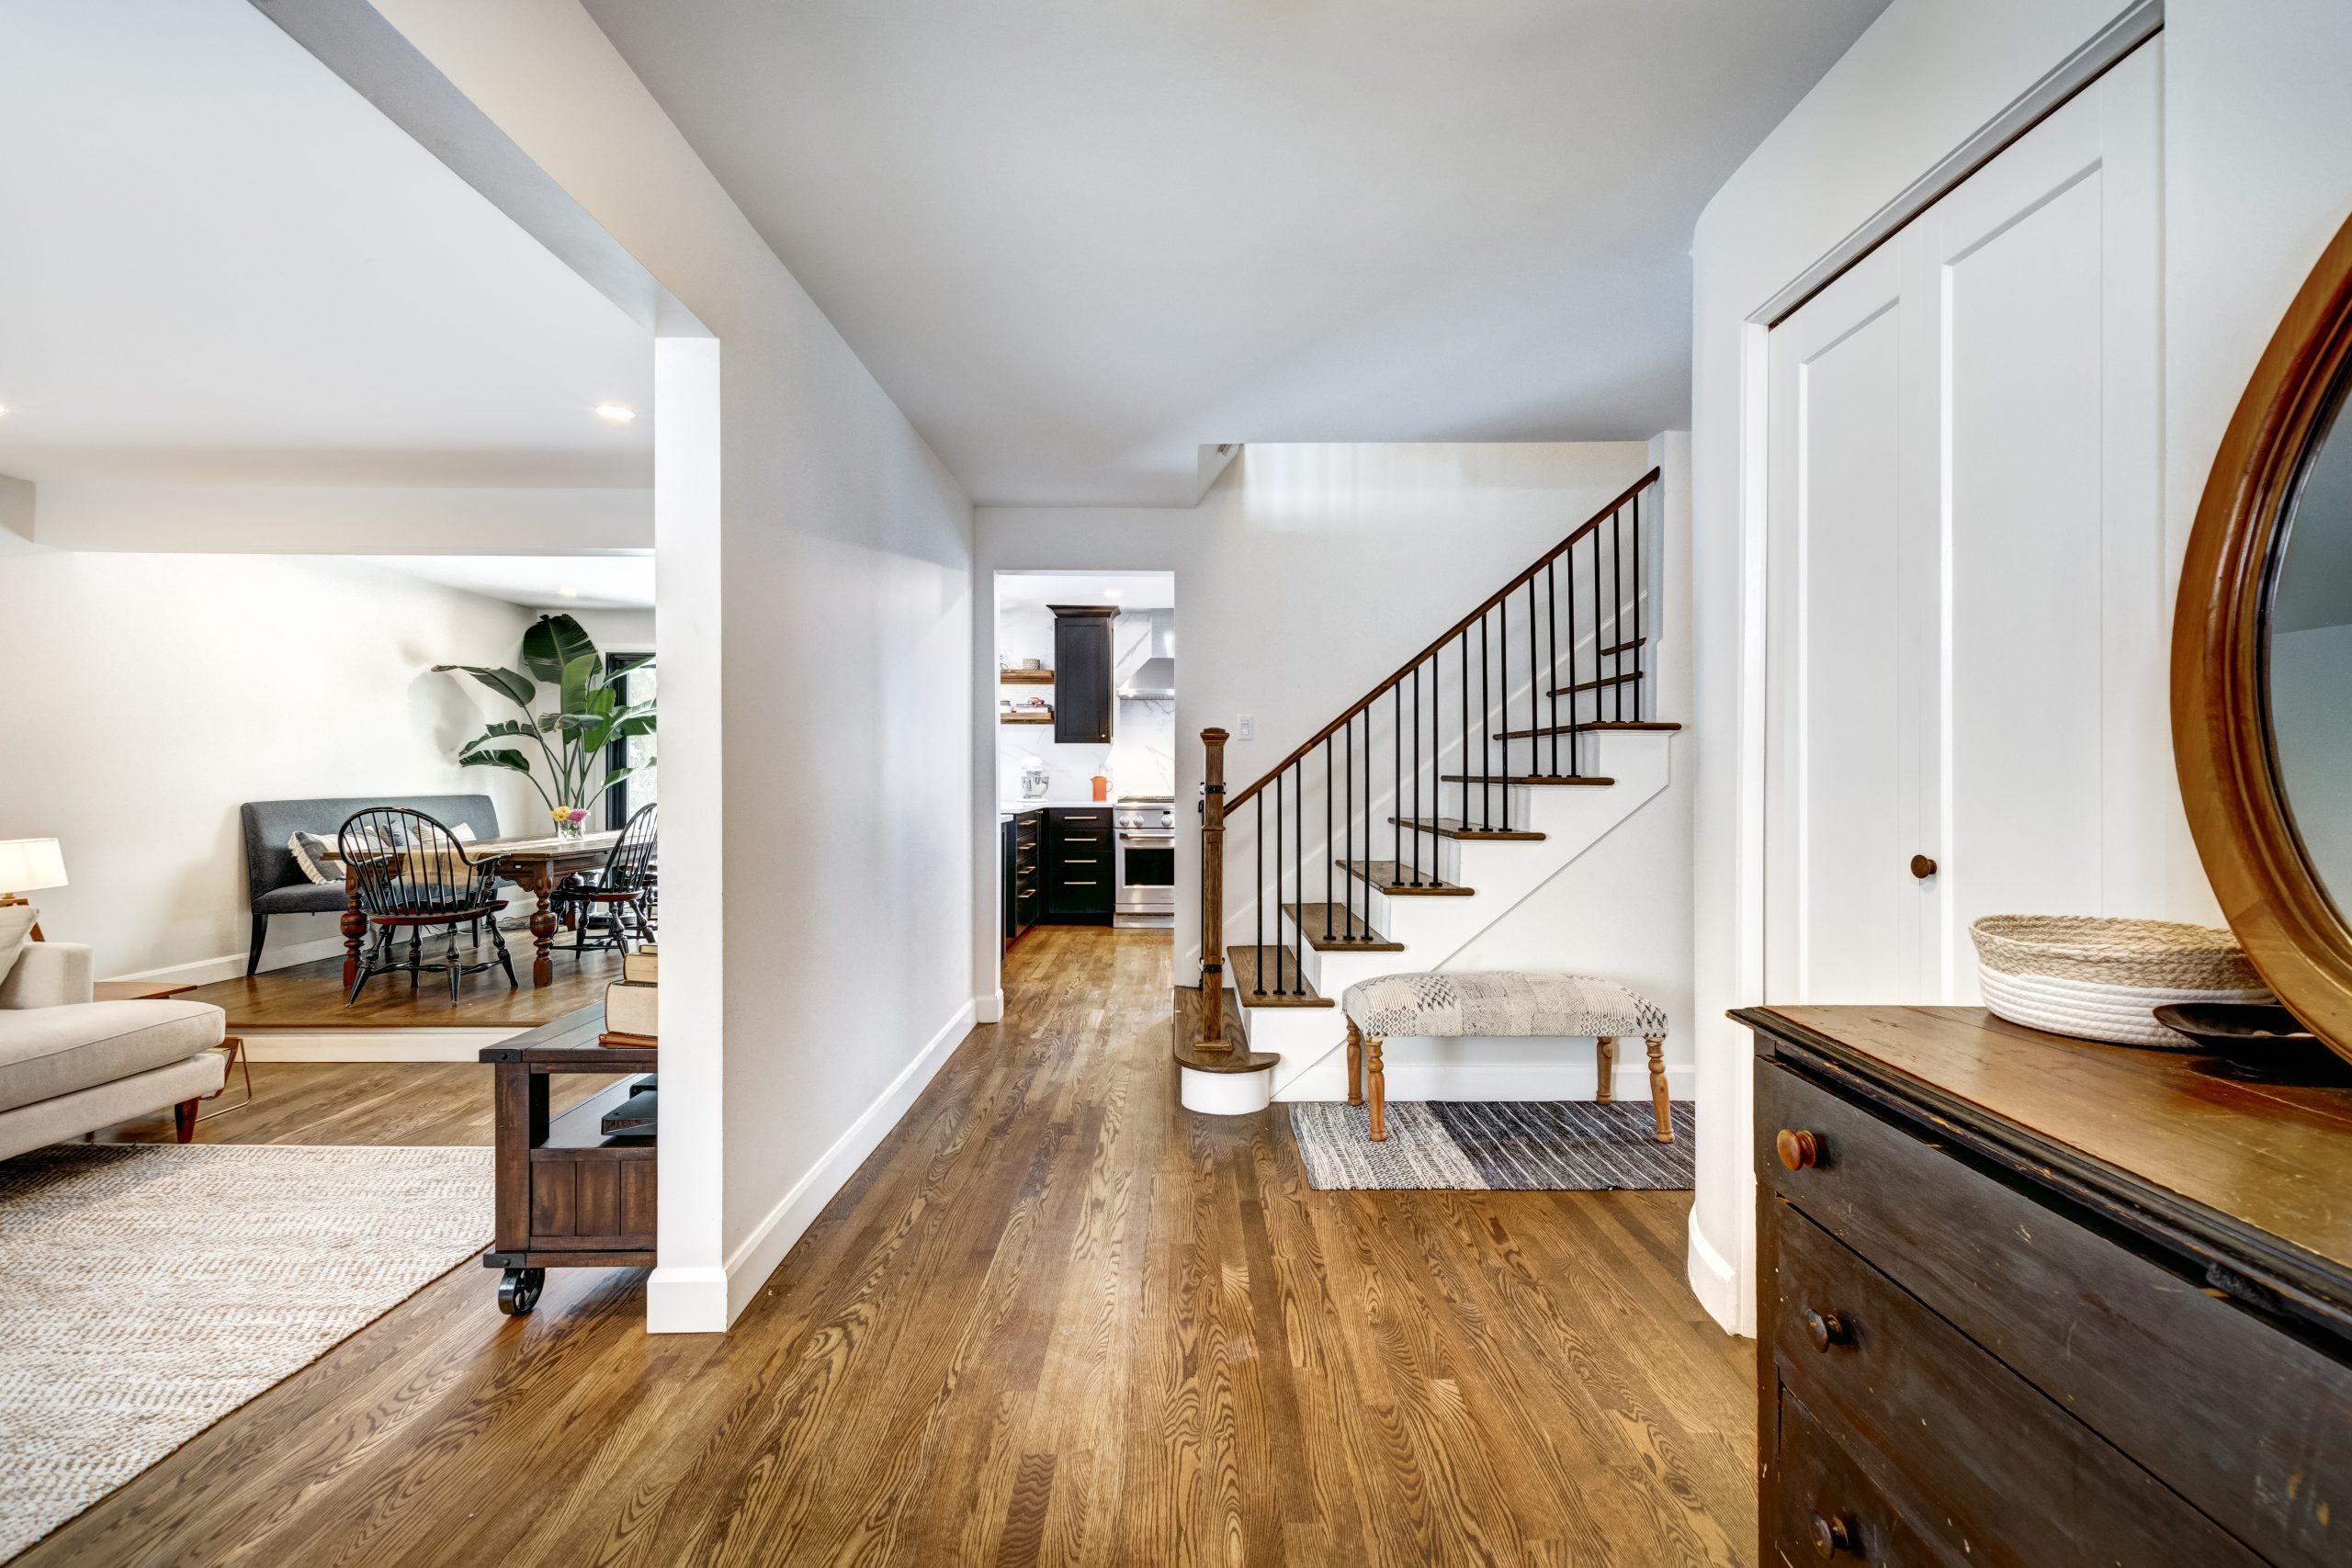 Overland Park Flooring Company, Overland Park Kansas Overland Park Flooring Company, Laminate Flooring